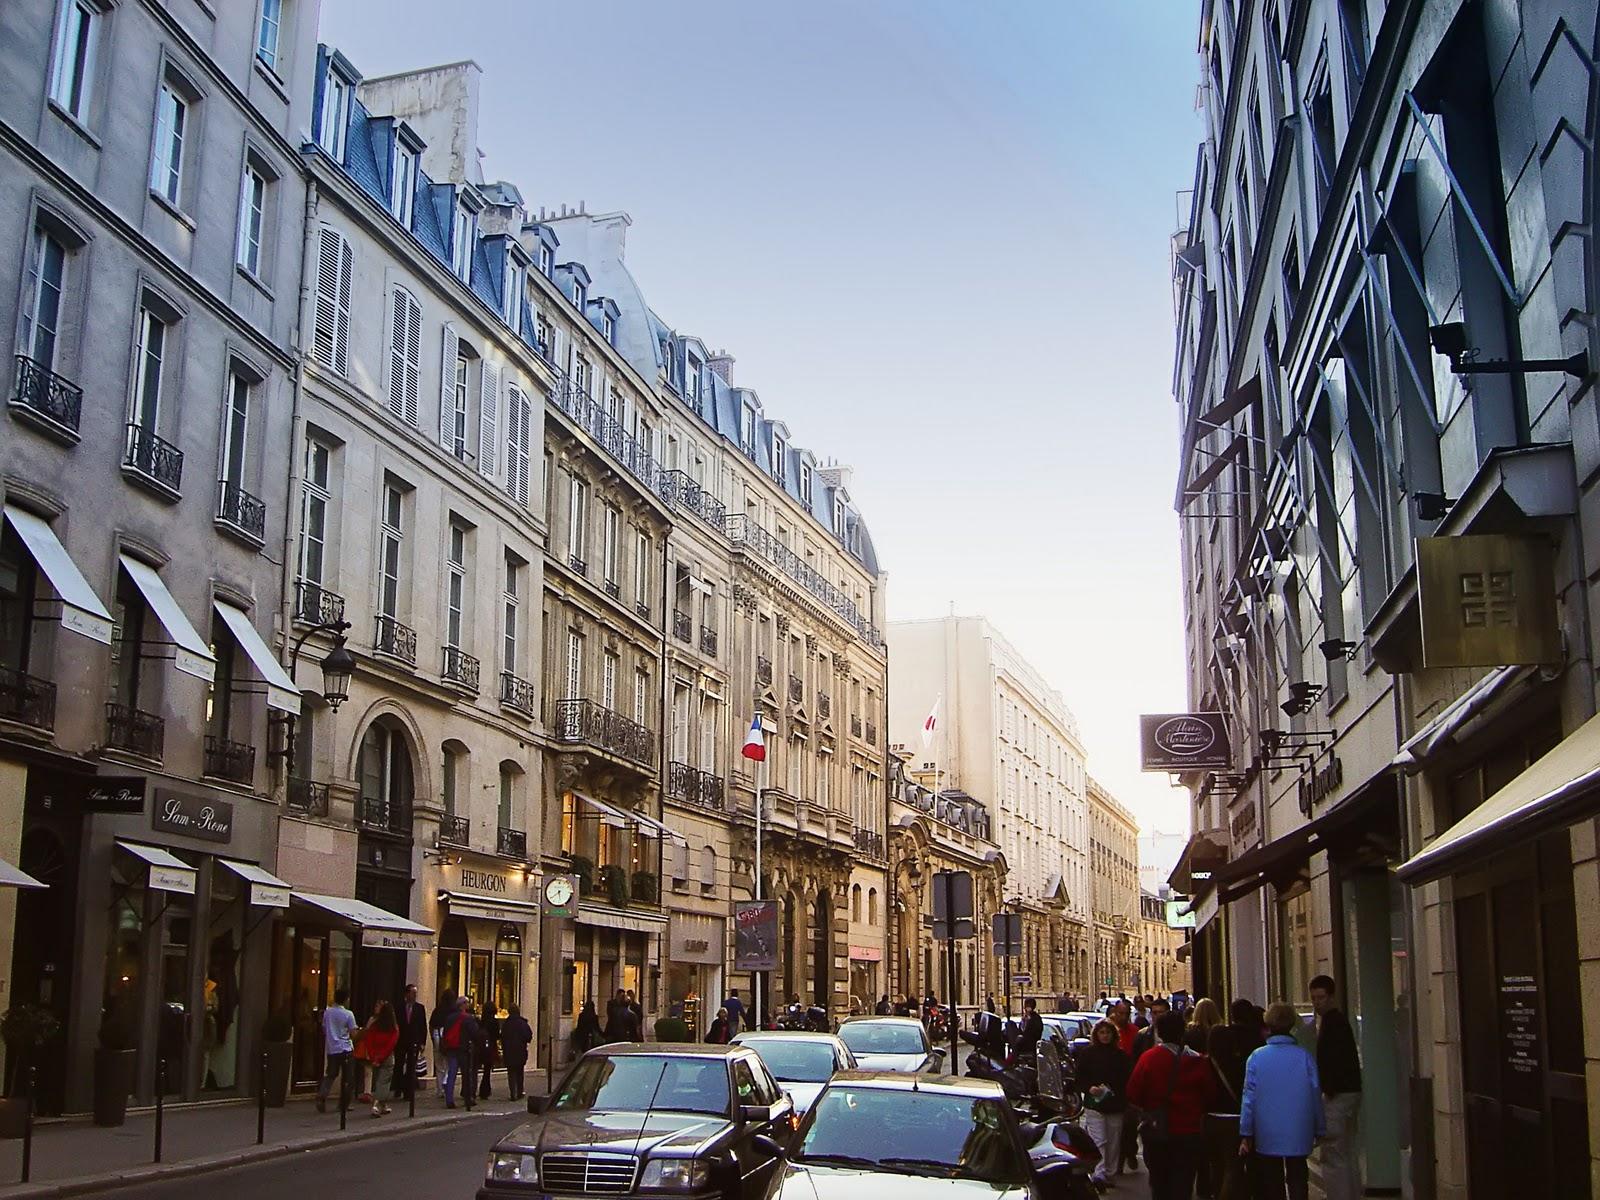 http://1.bp.blogspot.com/-tp07X12db2s/TZBg39C1vPI/AAAAAAAAEAc/dZ-b5knwCH0/s1600/Rue_du_Faubourg_St_Honore_dsc00792.jpg